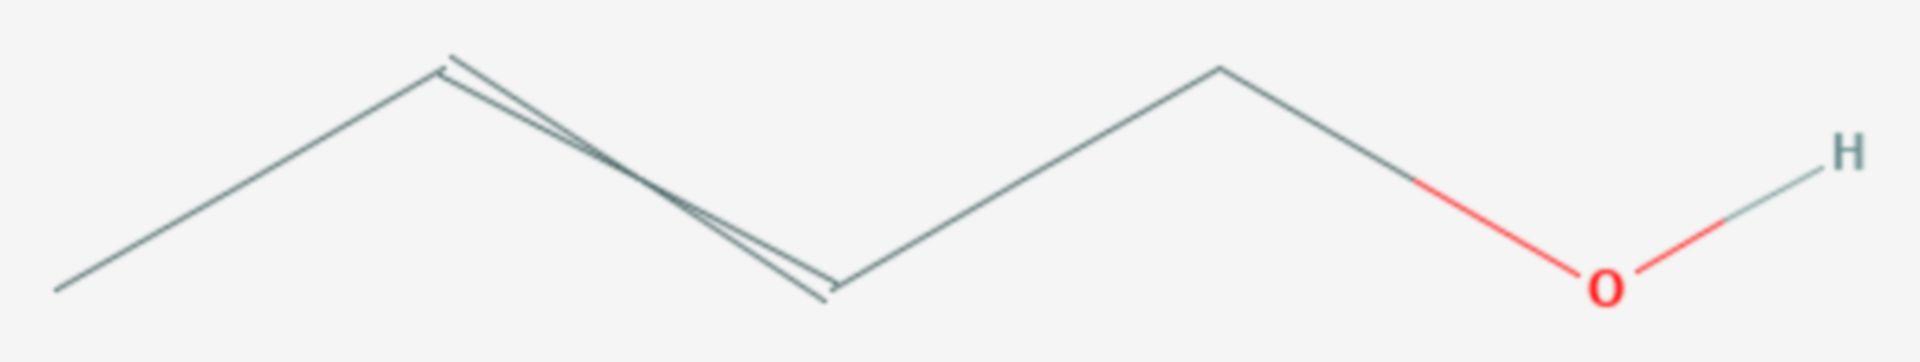 Crotylalkohol (Strukturformel)